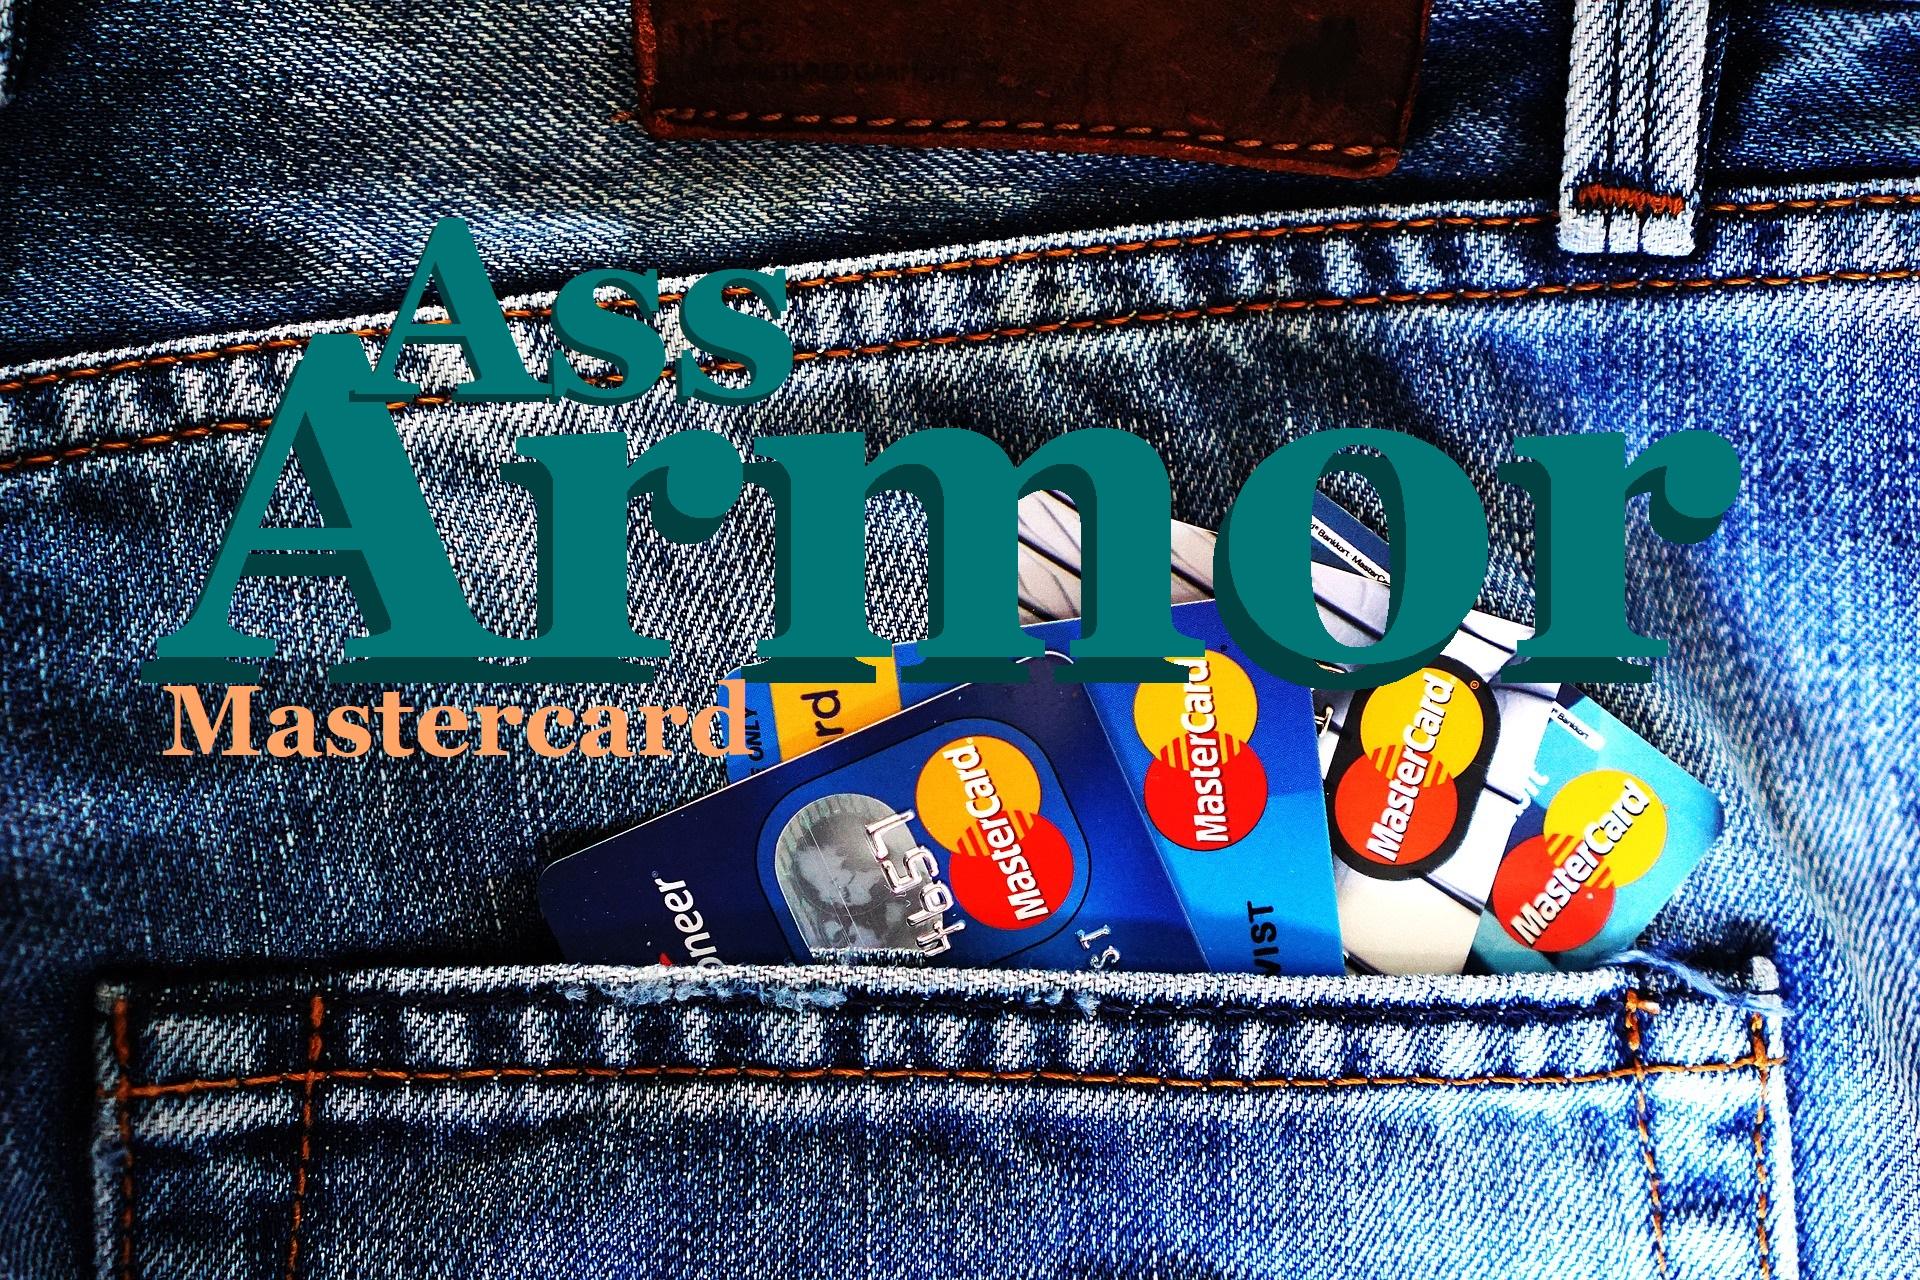 Mastercard Ass